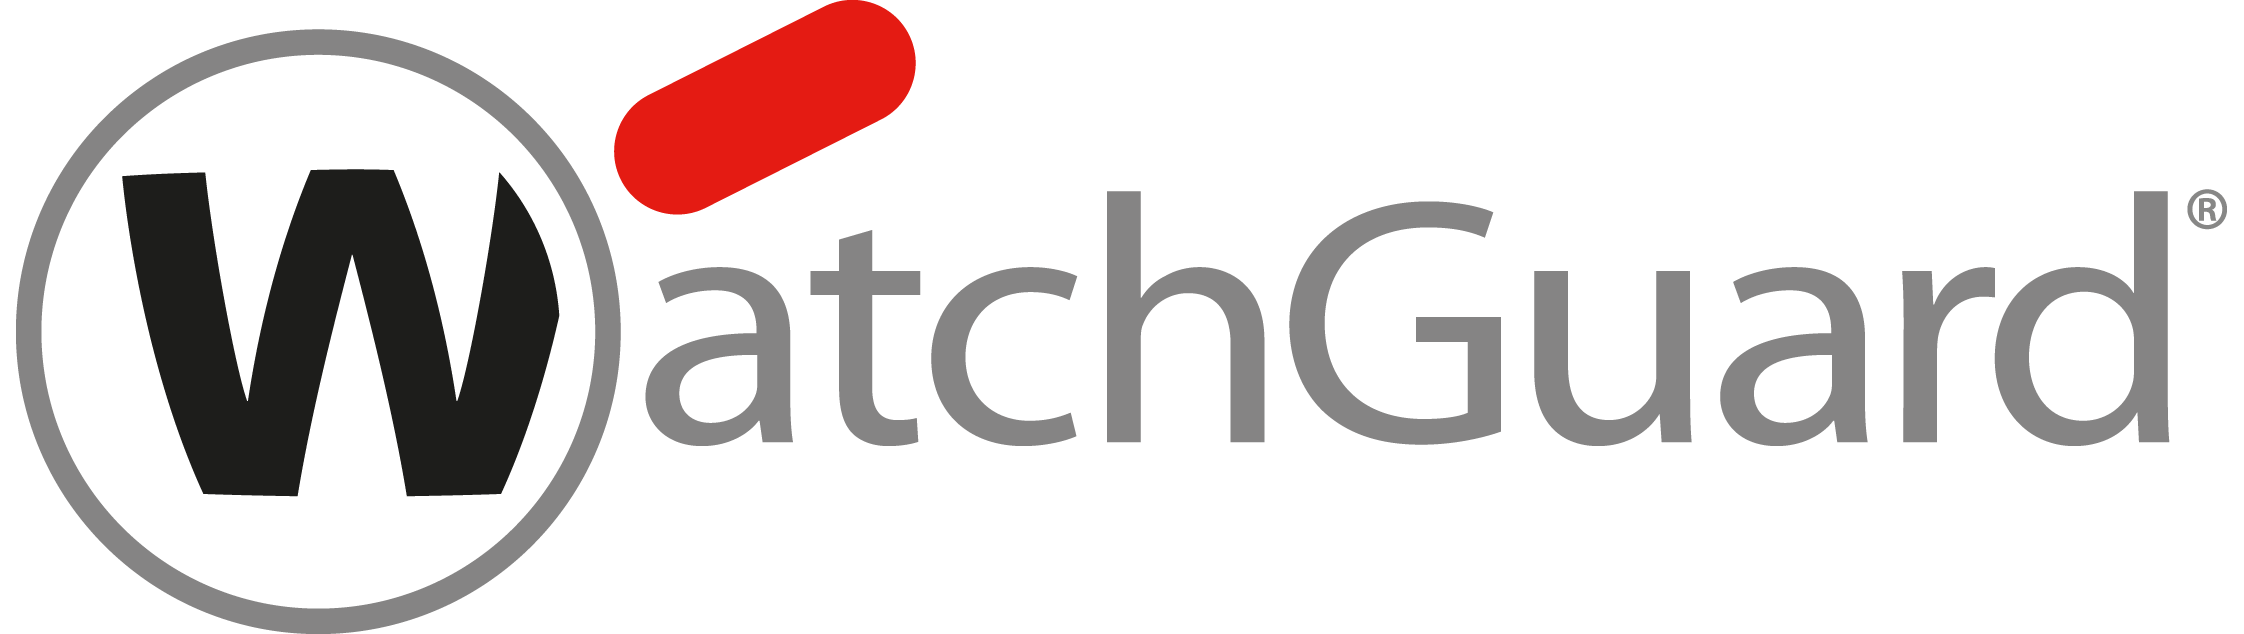 WatchGuard Partner logo-marsworth-computing.png